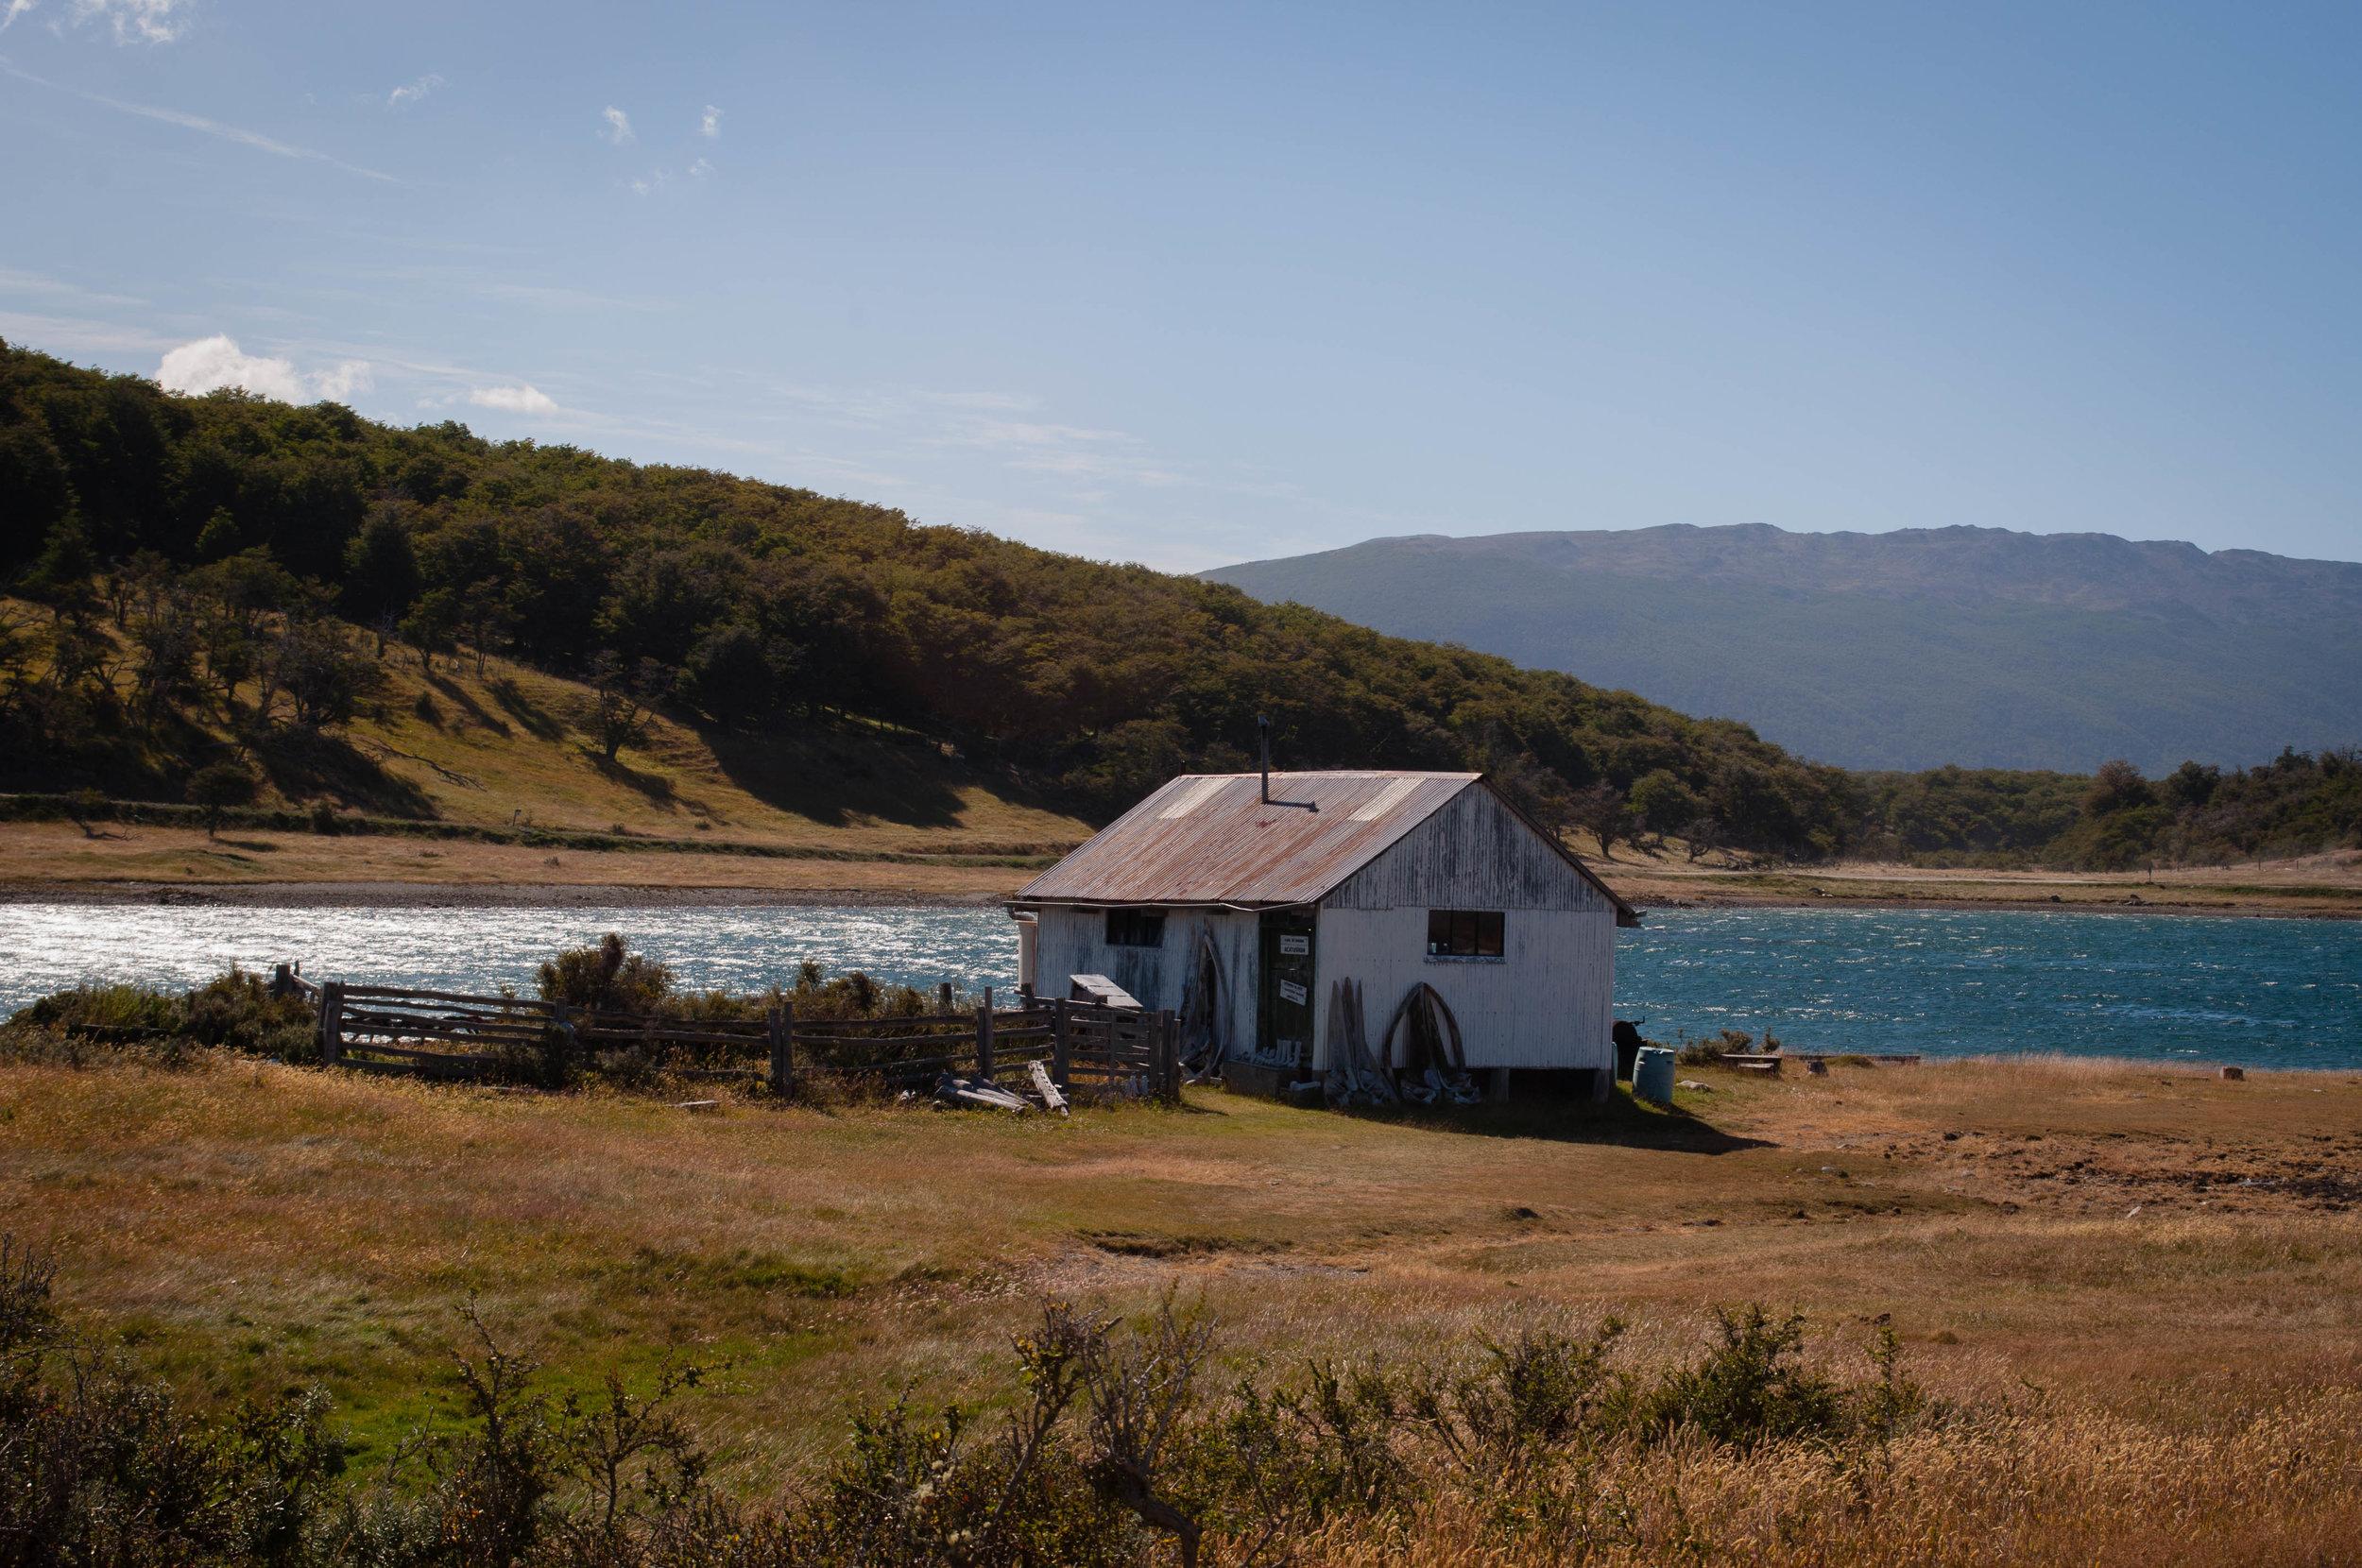 Haberton ranch